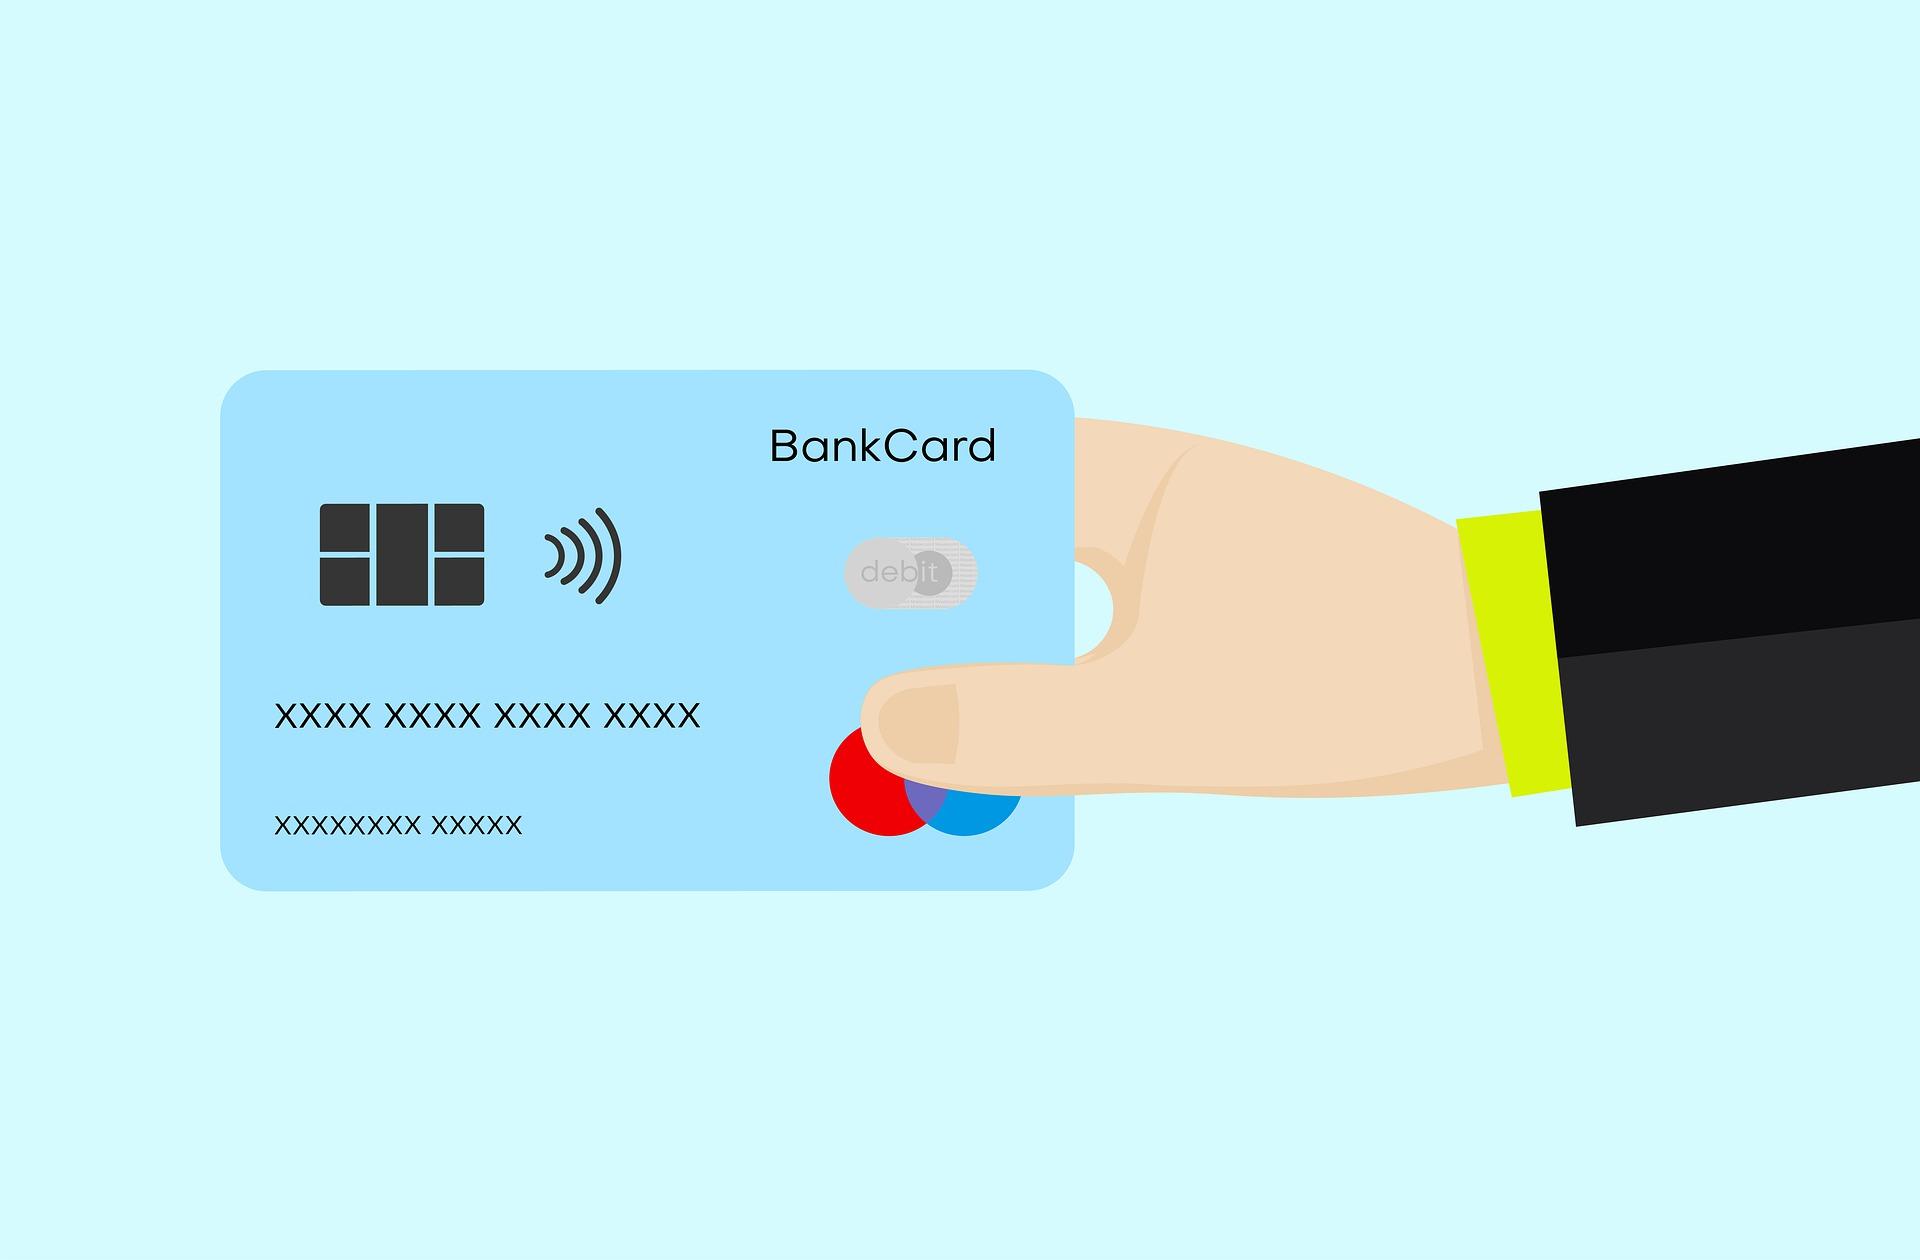 A credit card representing debt